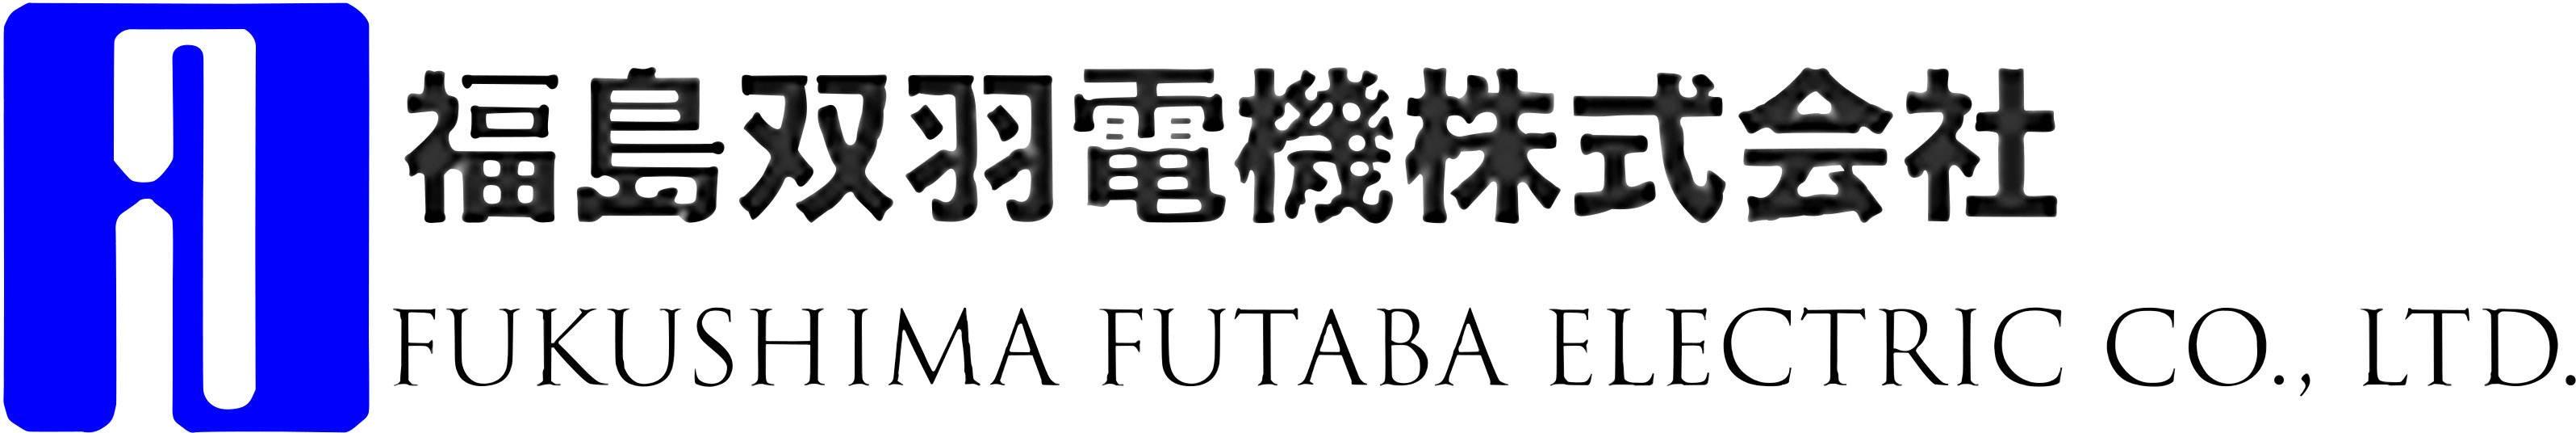 Fukushima Futaba